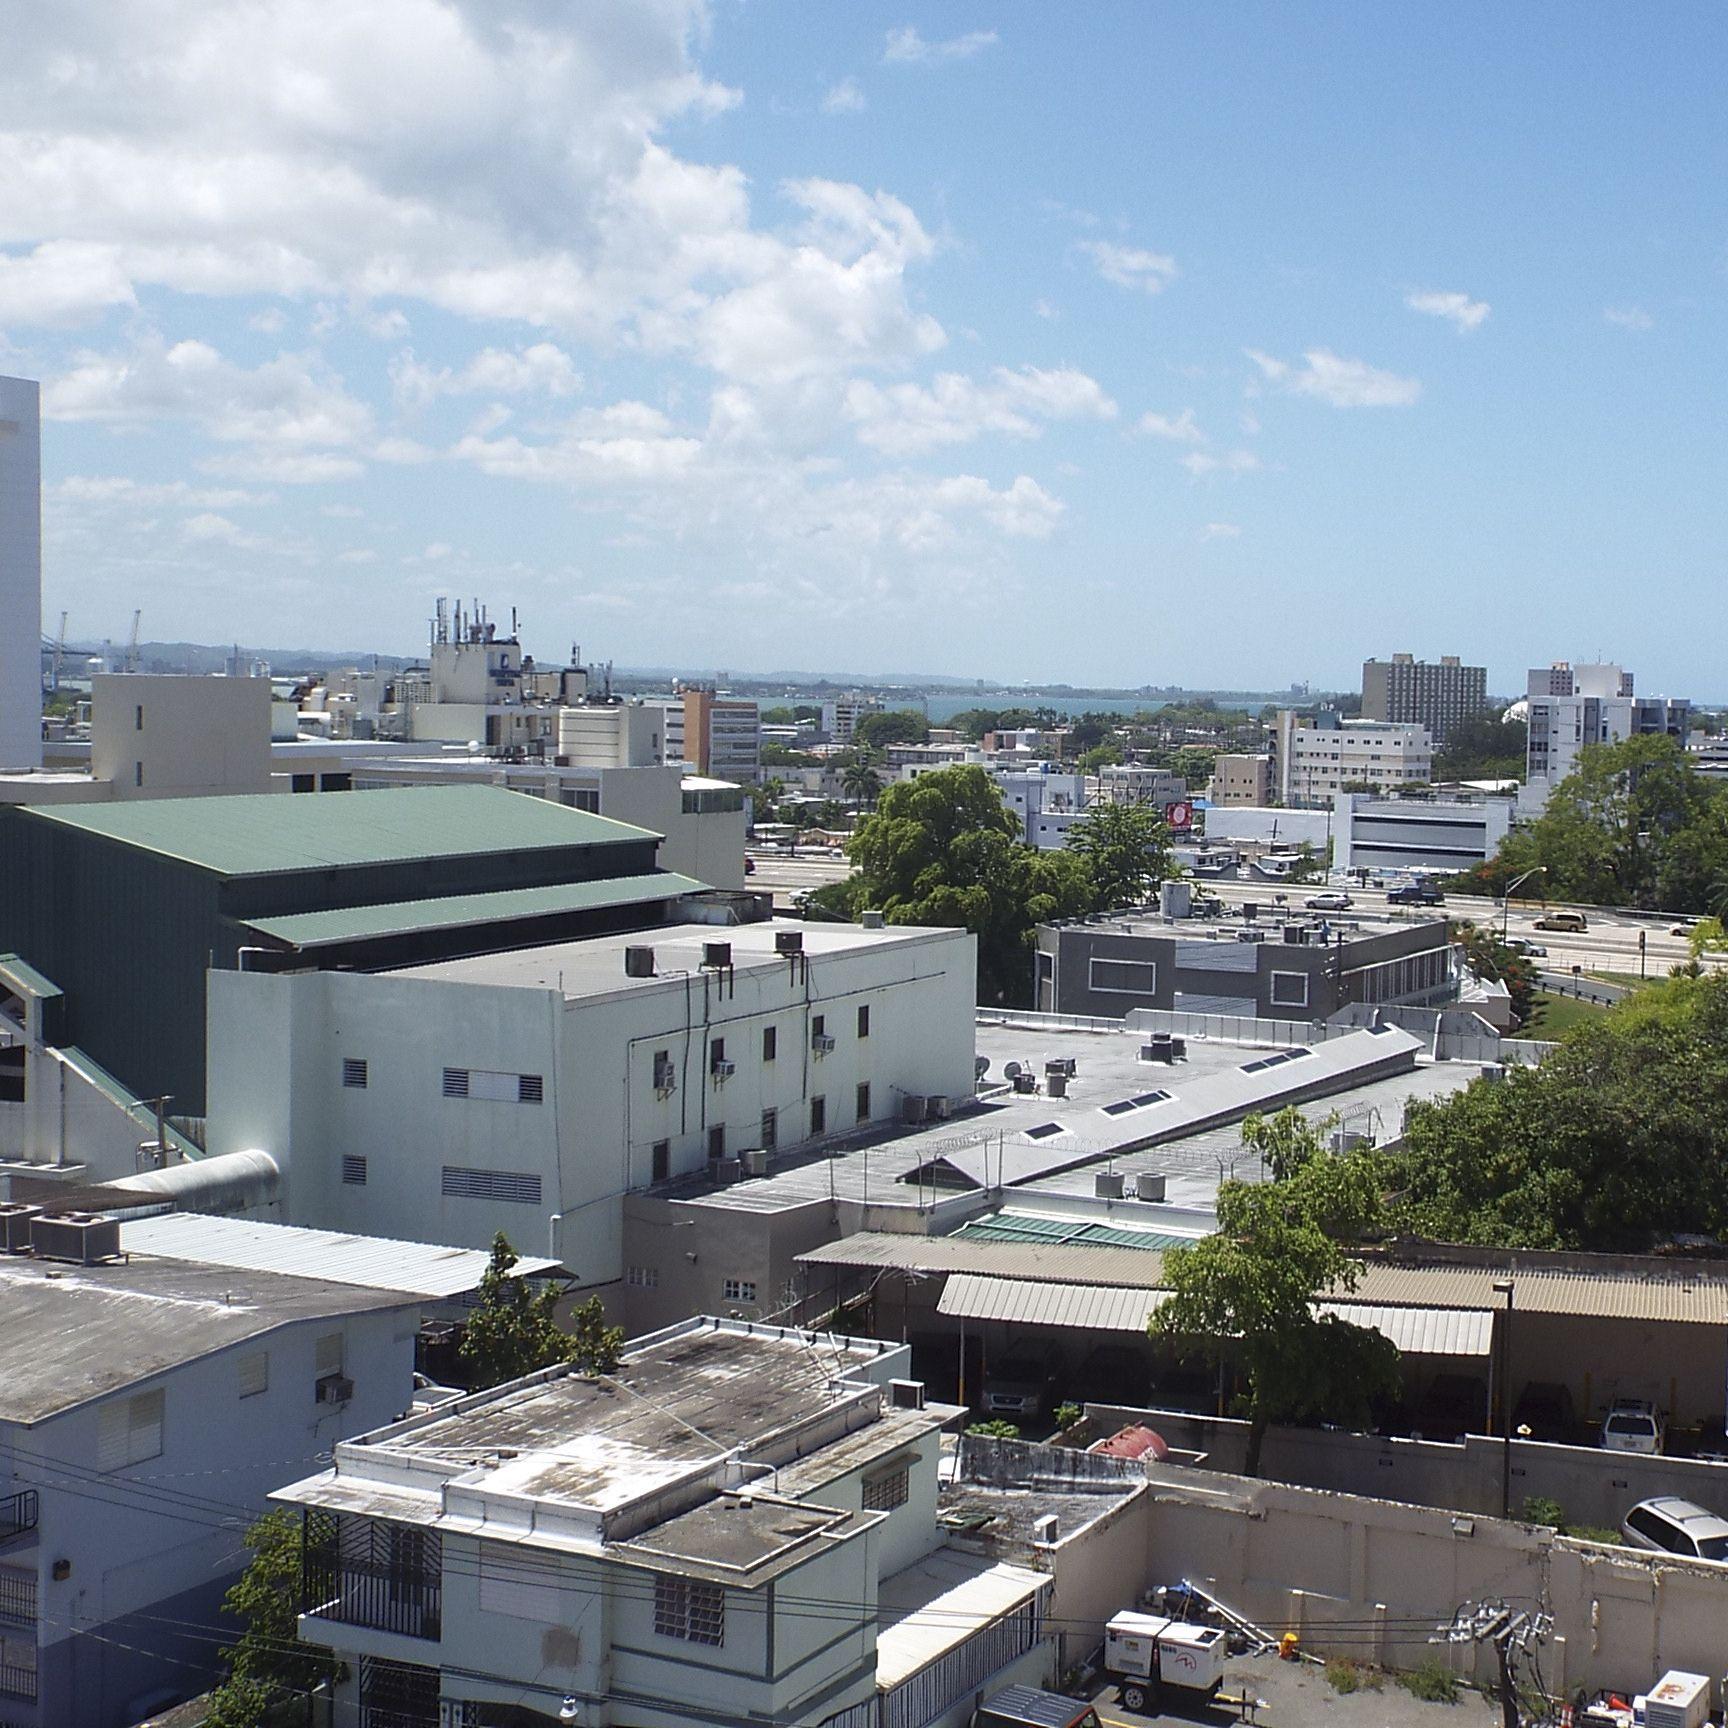 A spectacular view of the beautiful city of Santurce from my Hotel.  #santurceesley #santurce  #puertorico  #turismo  #descubre #whateverpr  #whateverpuertorico